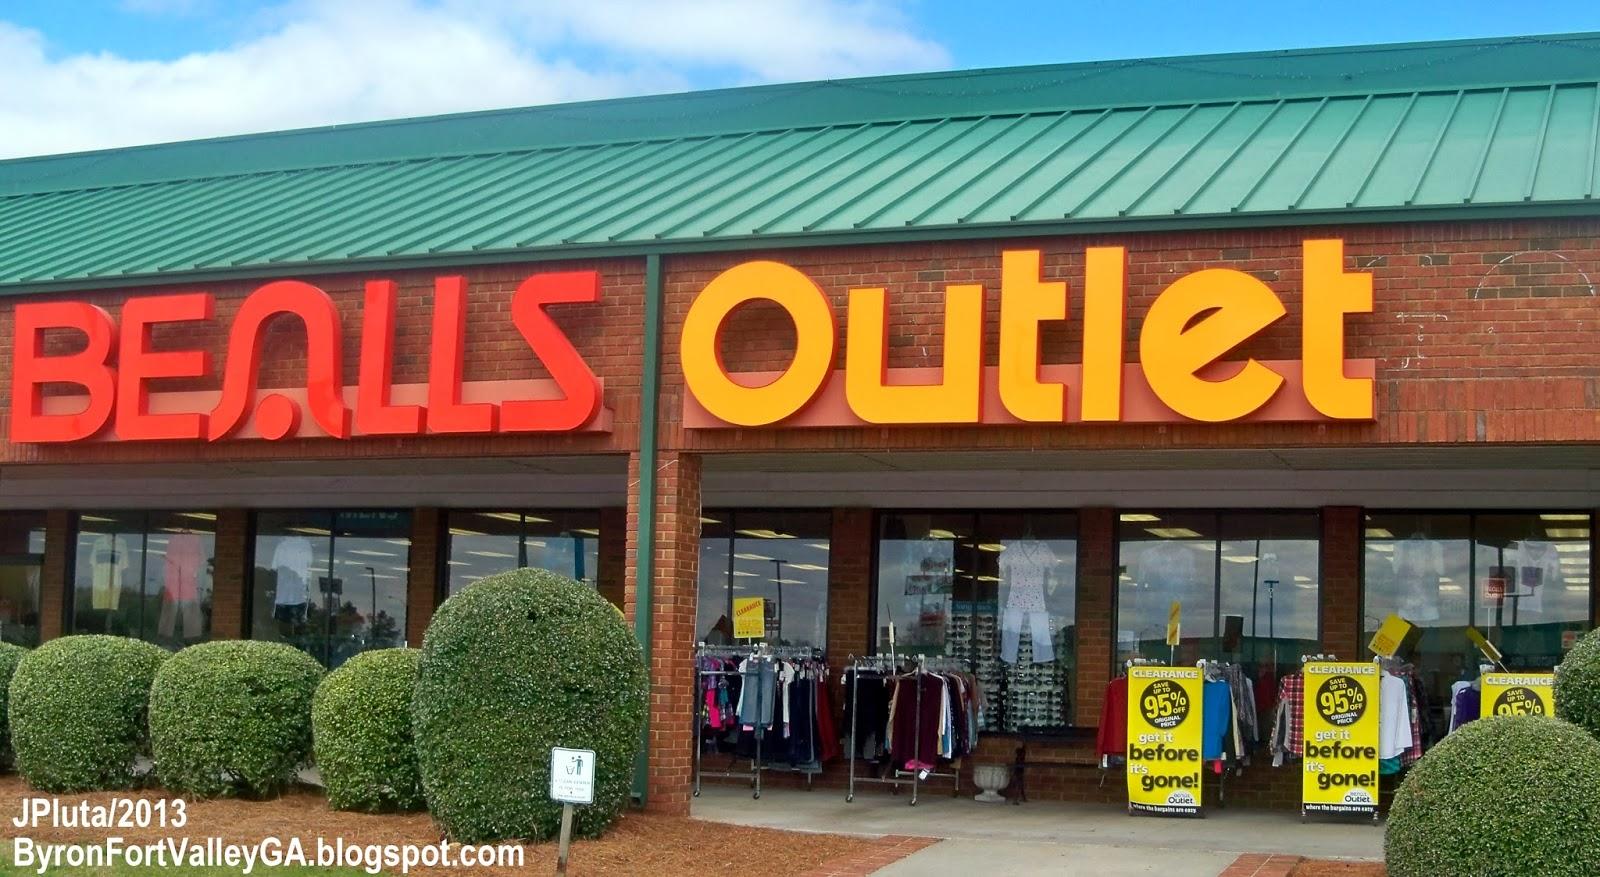 Bealls clothing store website